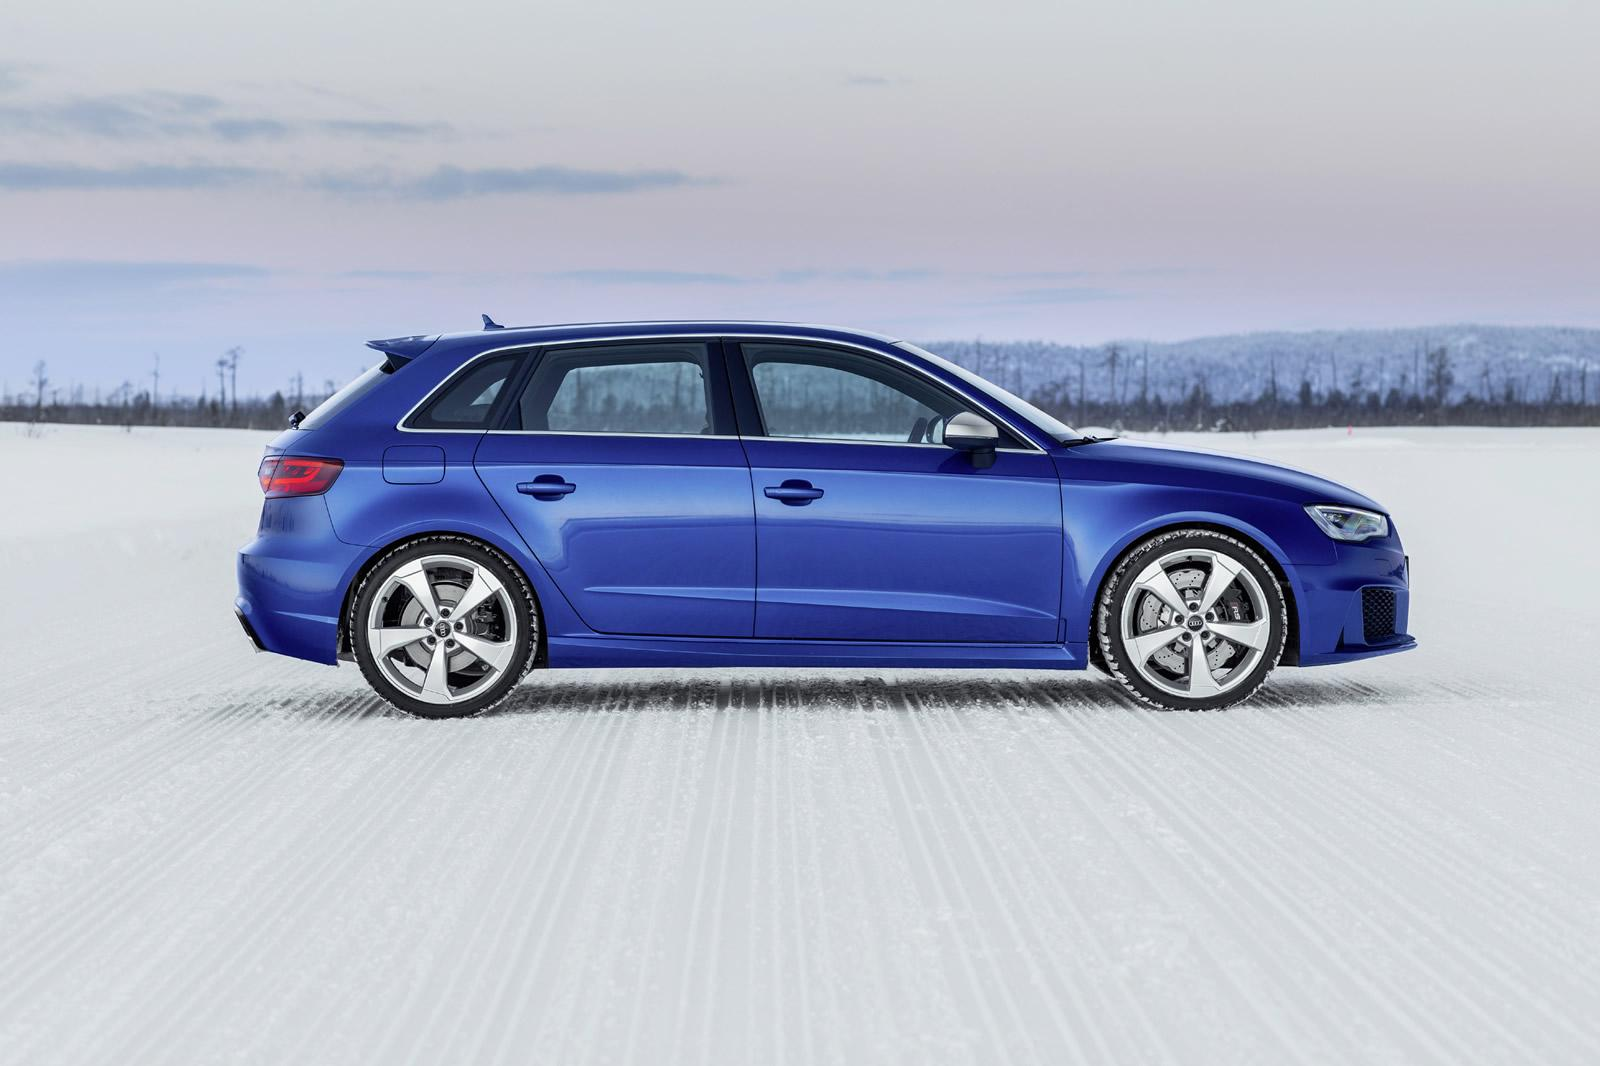 Audi Cars - News: Audi showcases RS3 Sportback in Sepang Blue